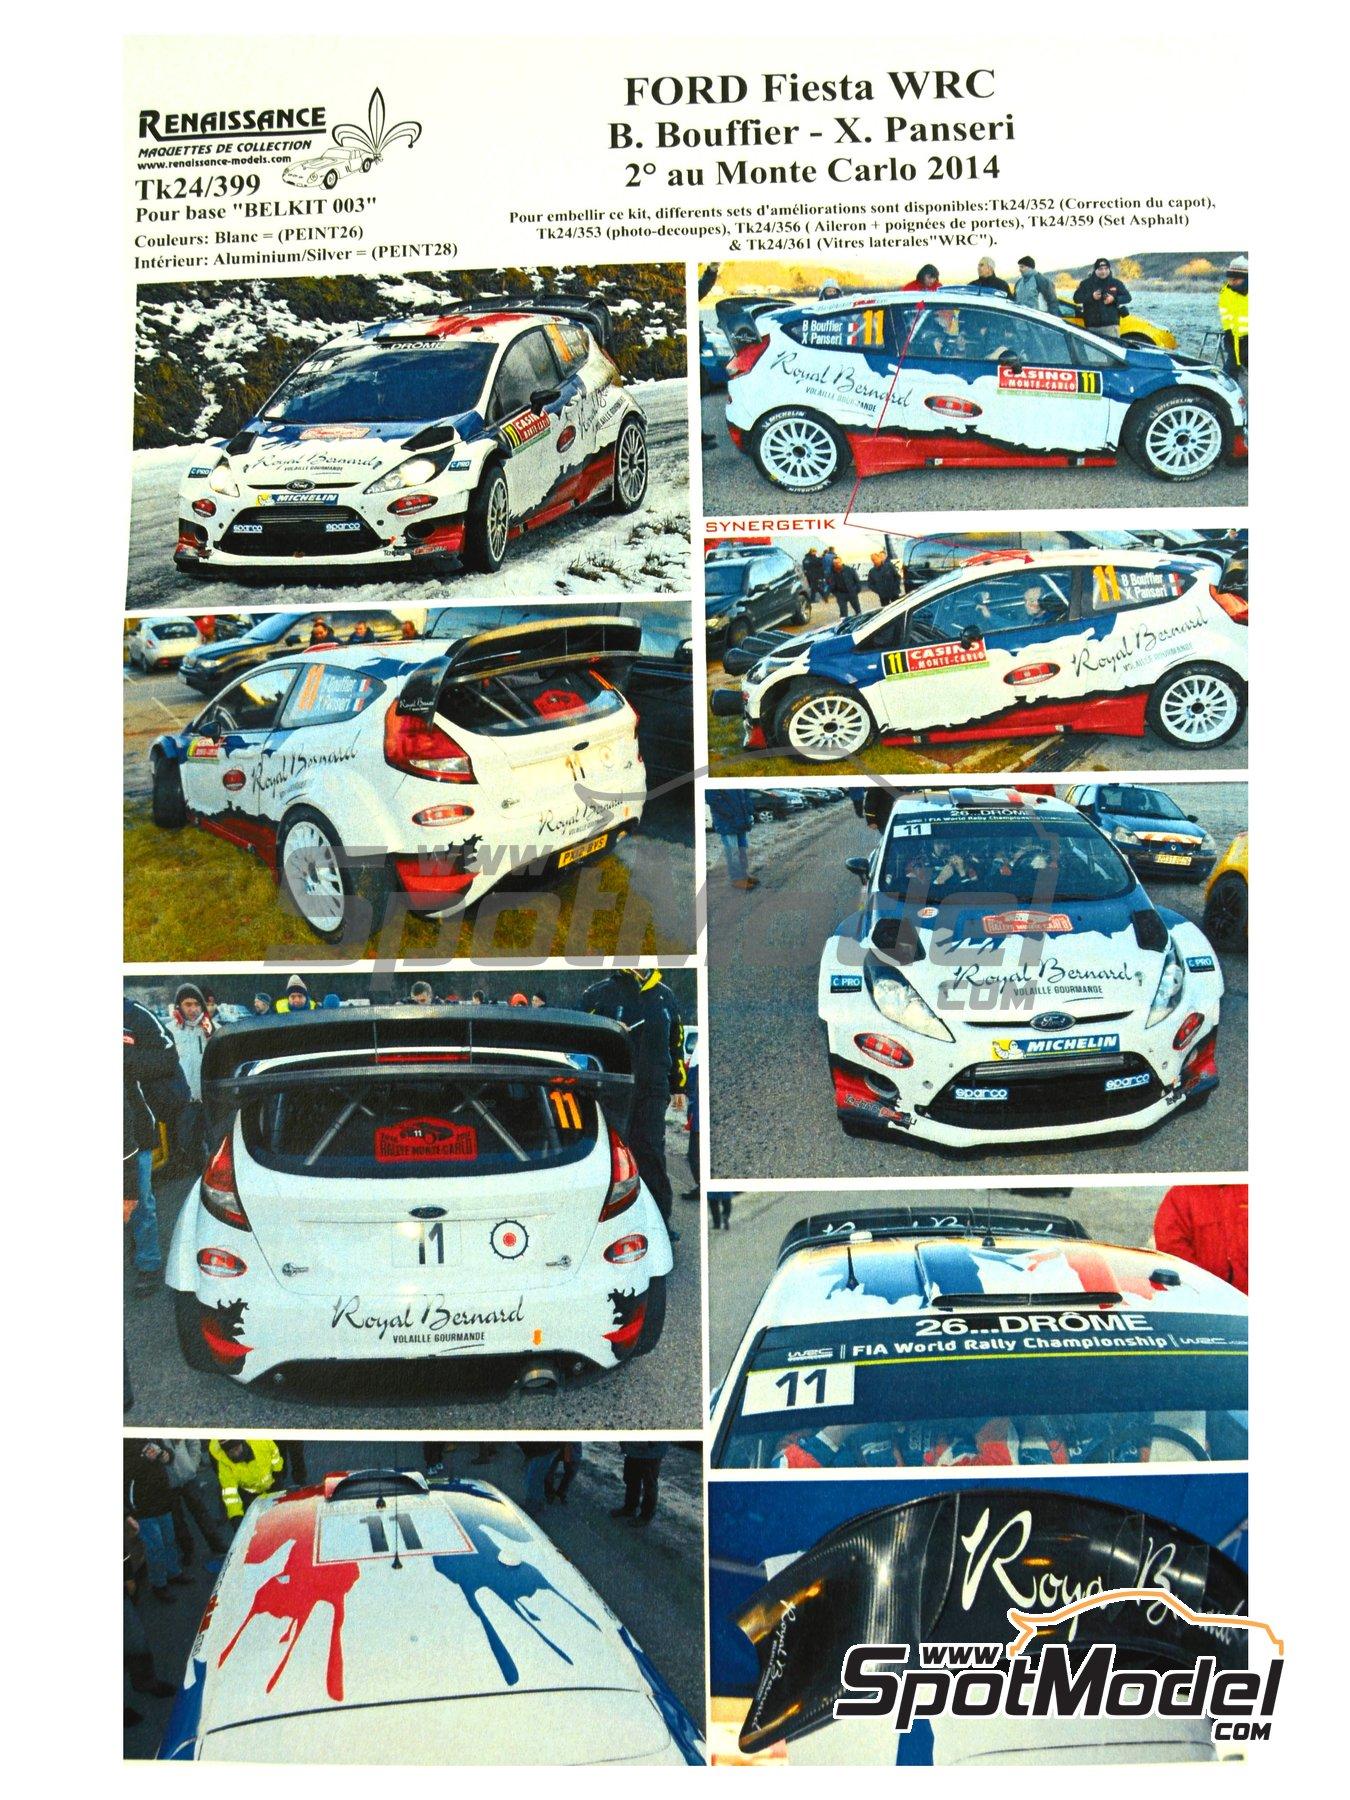 Ford Fiesta WRC Royal Bernard - Montecarlo Rally - Rallye Automobile de Monte-Carlo 2014 | Decals in 1/24 scale manufactured by Renaissance Models (ref.TK24-399) image